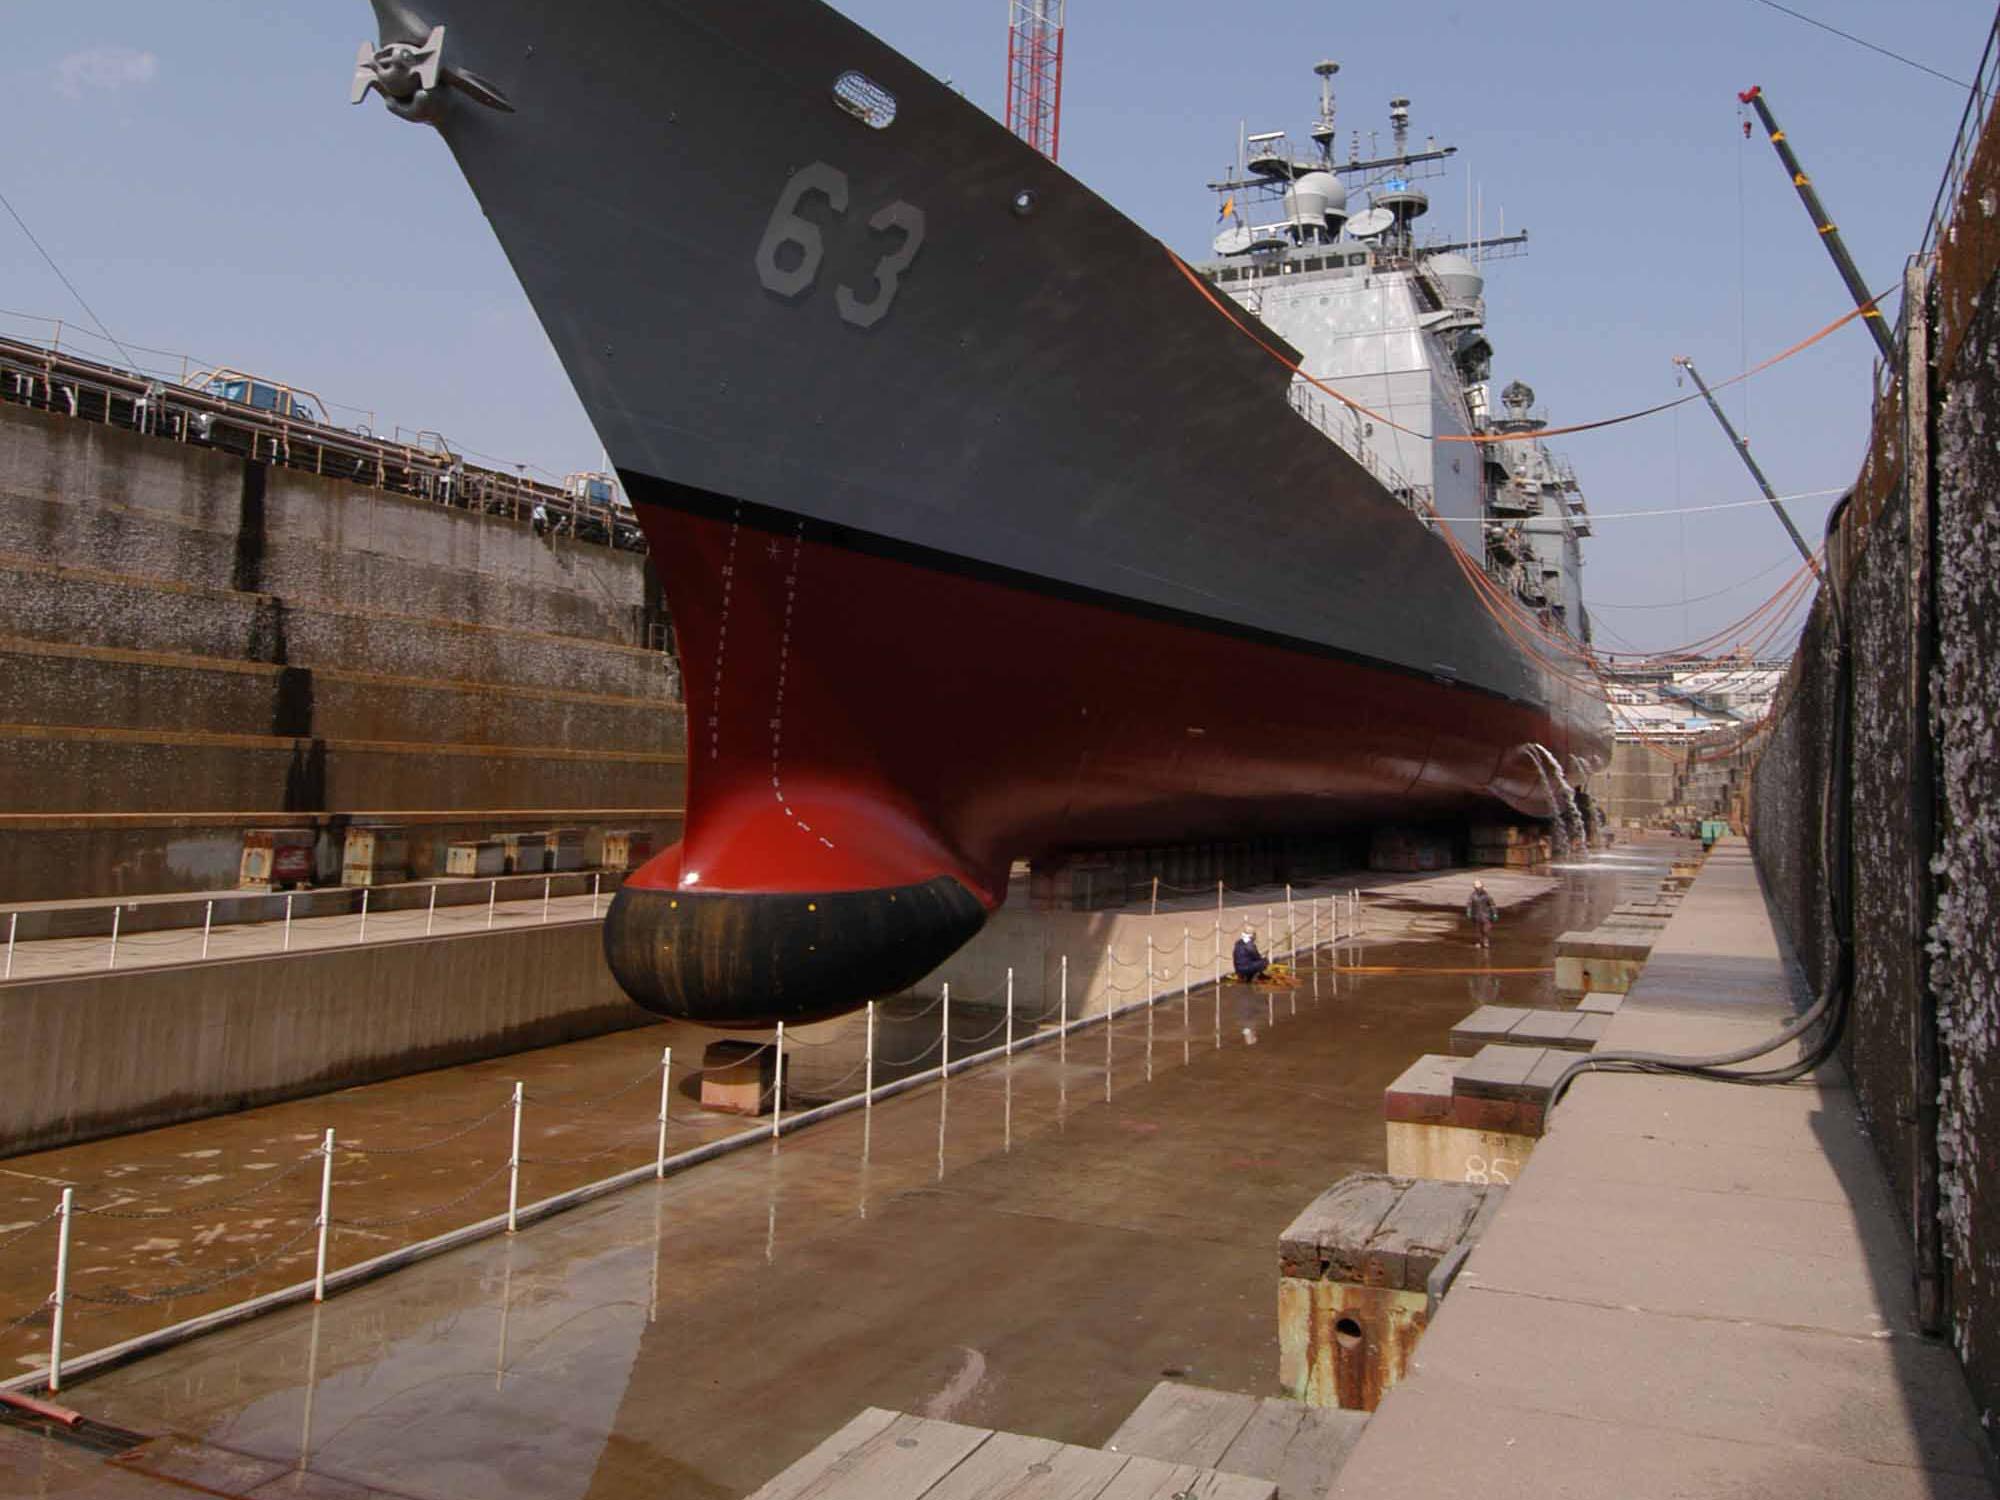 SQS-53_Hull-Mounted_Sonar_CG-63_Cowpens_2004-03-16